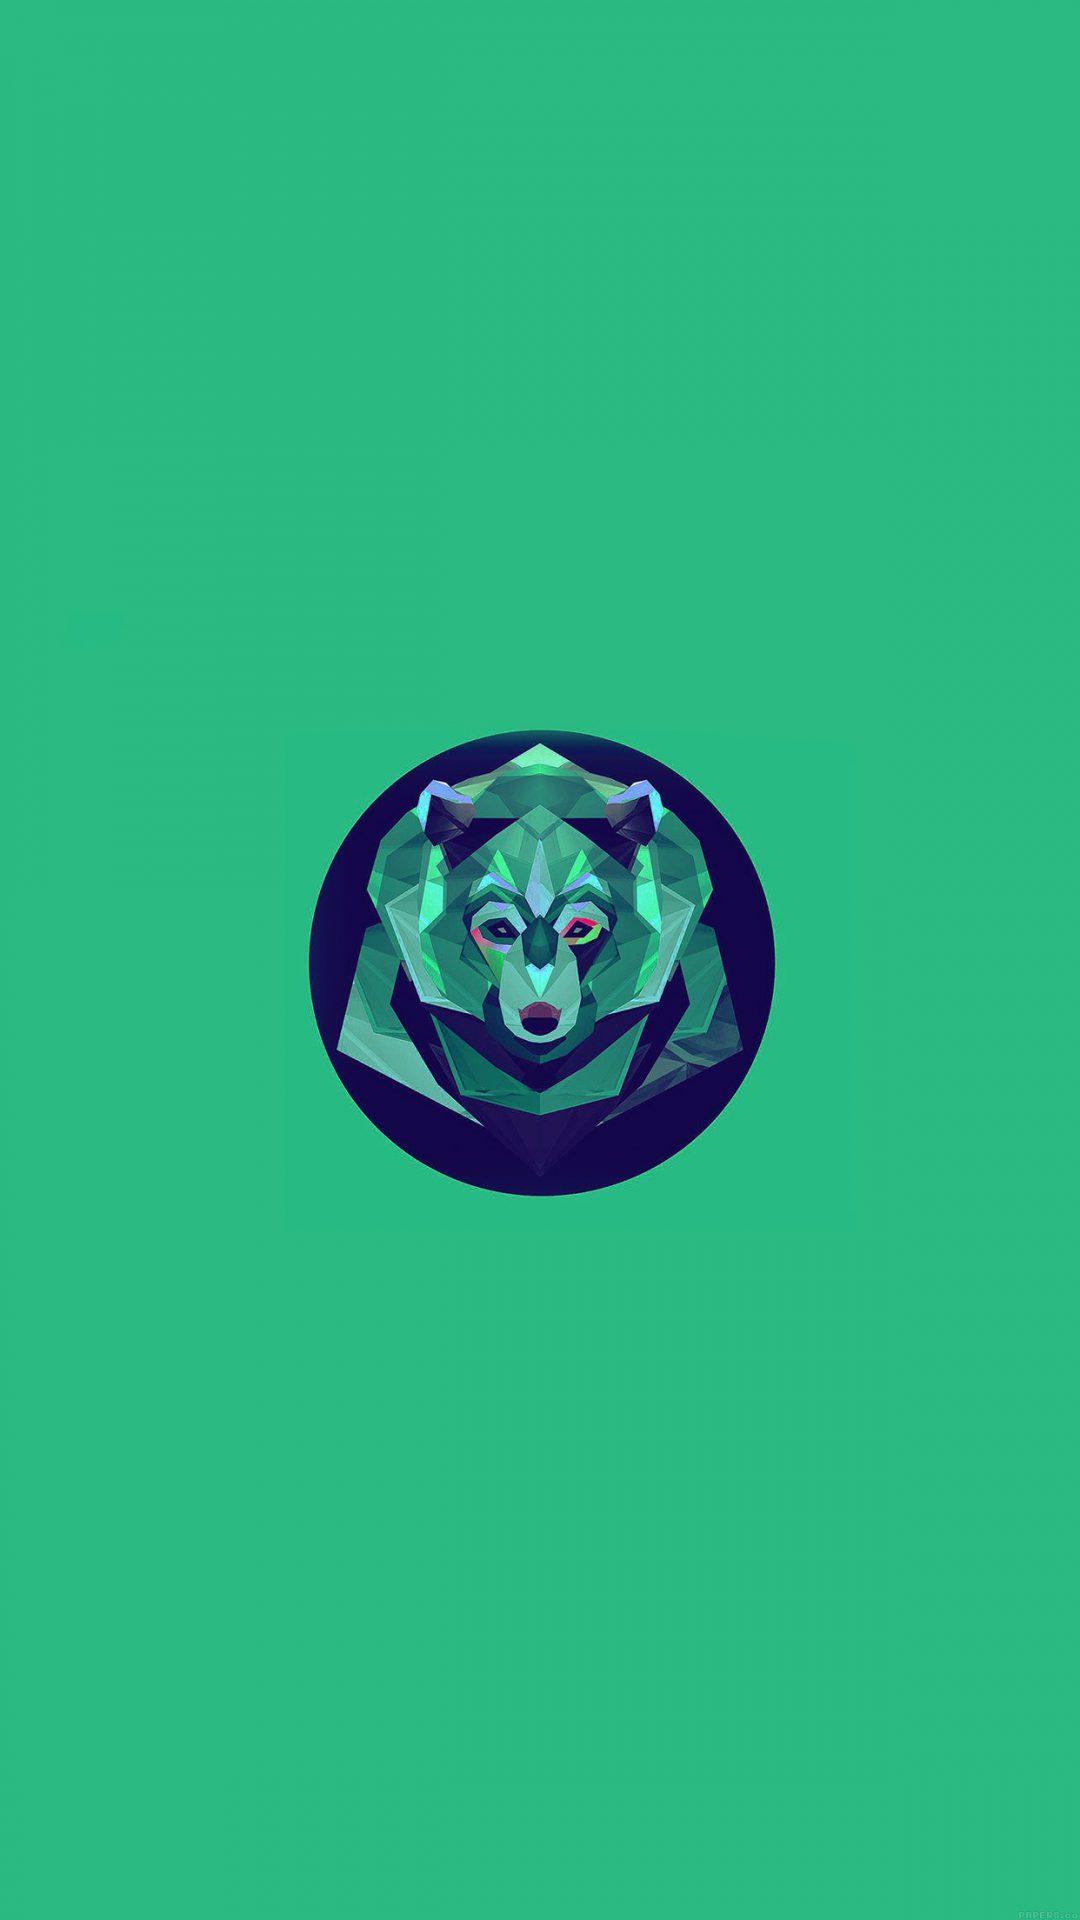 Bear Polygon Art Animal Green